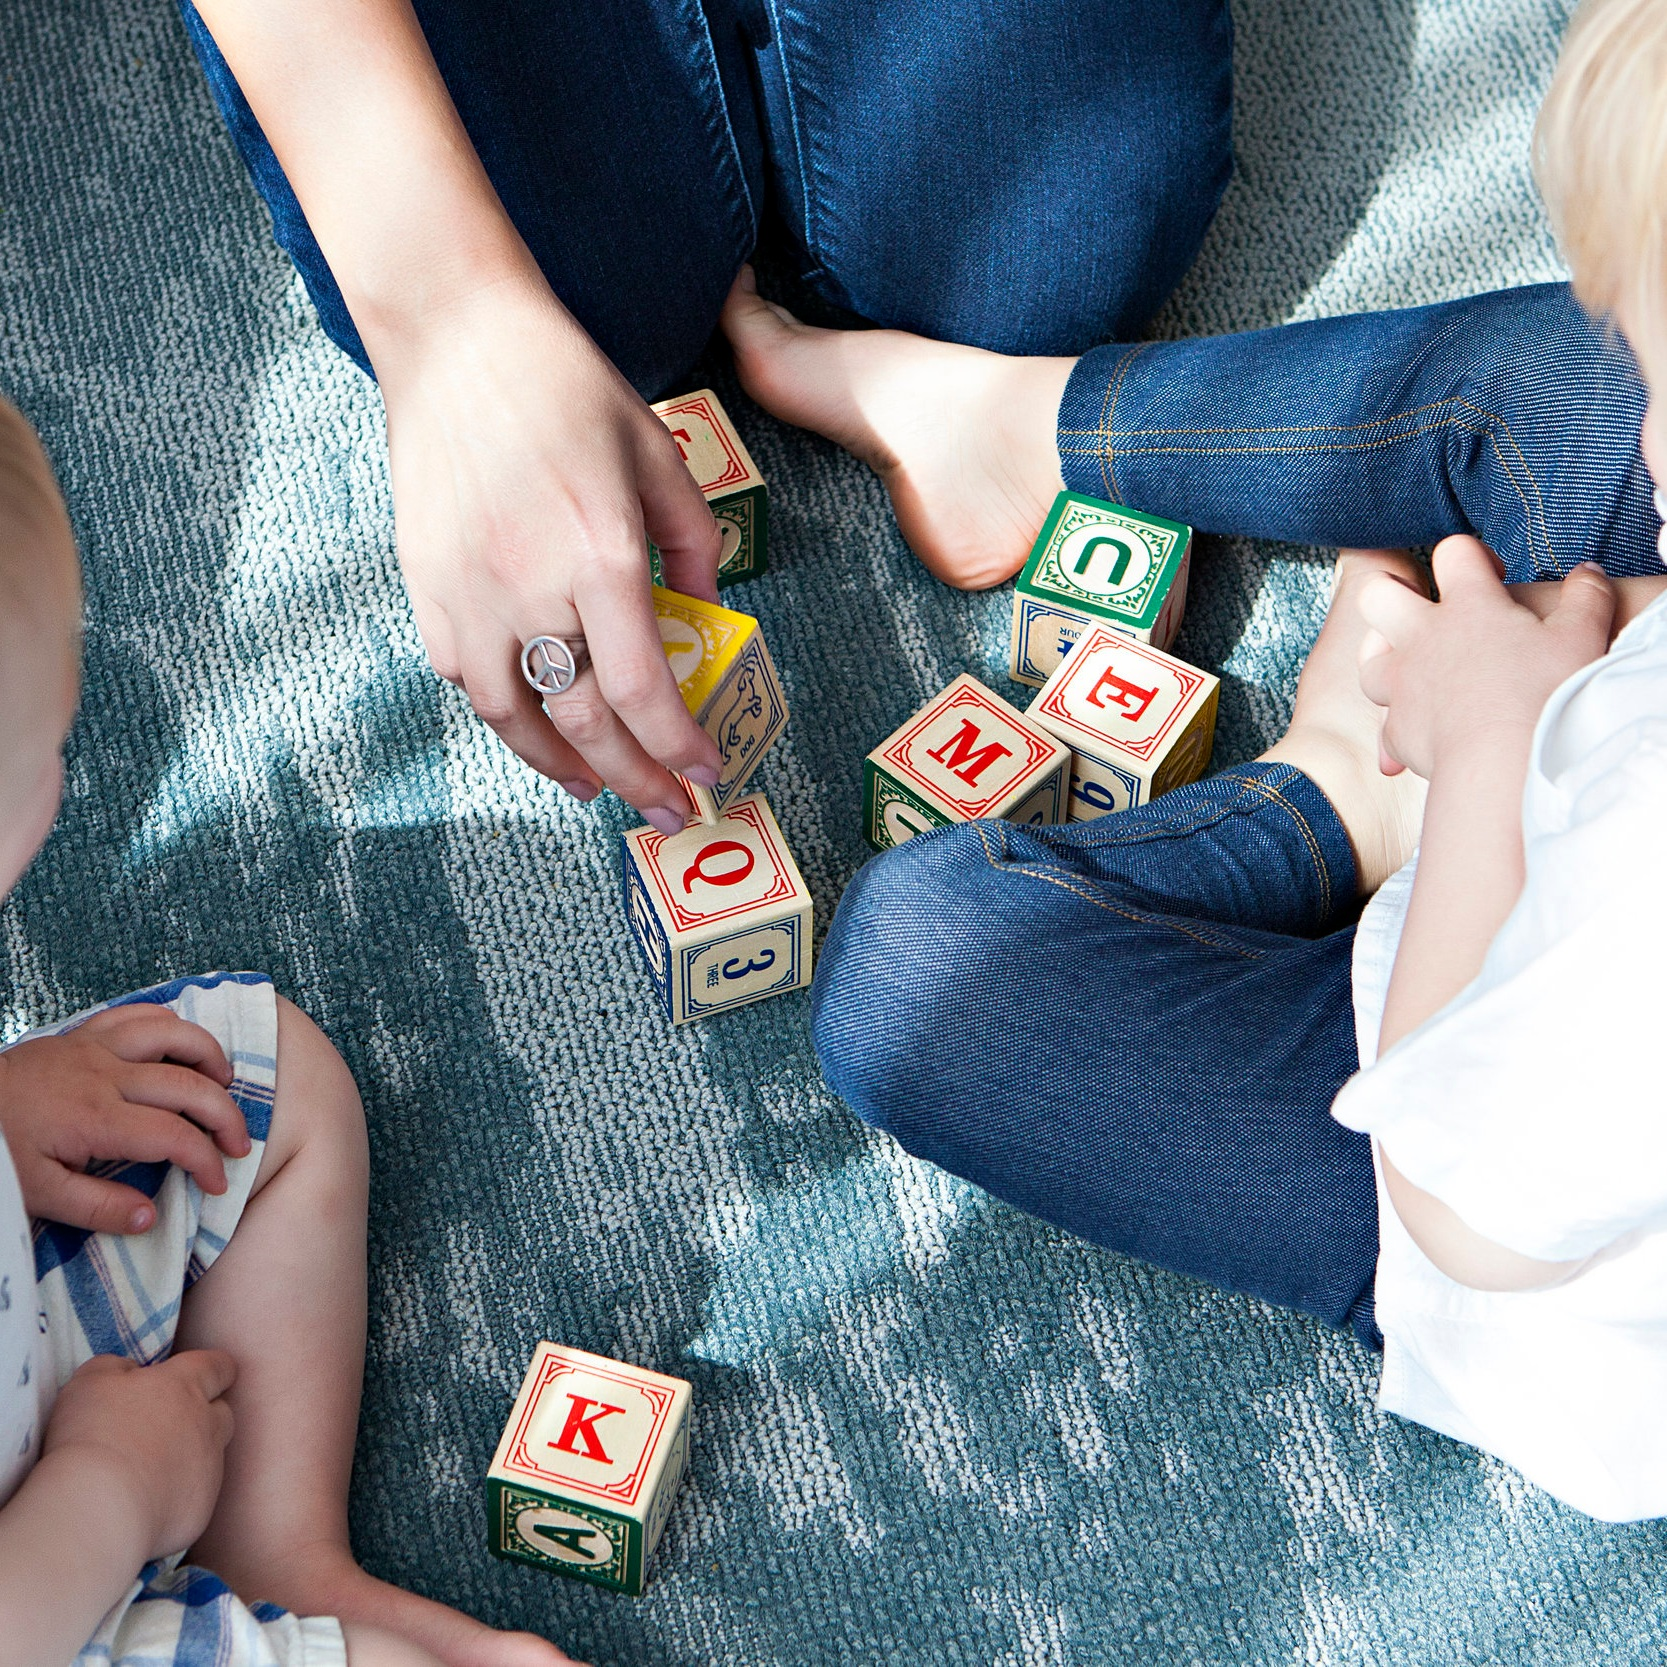 Parenting Support -